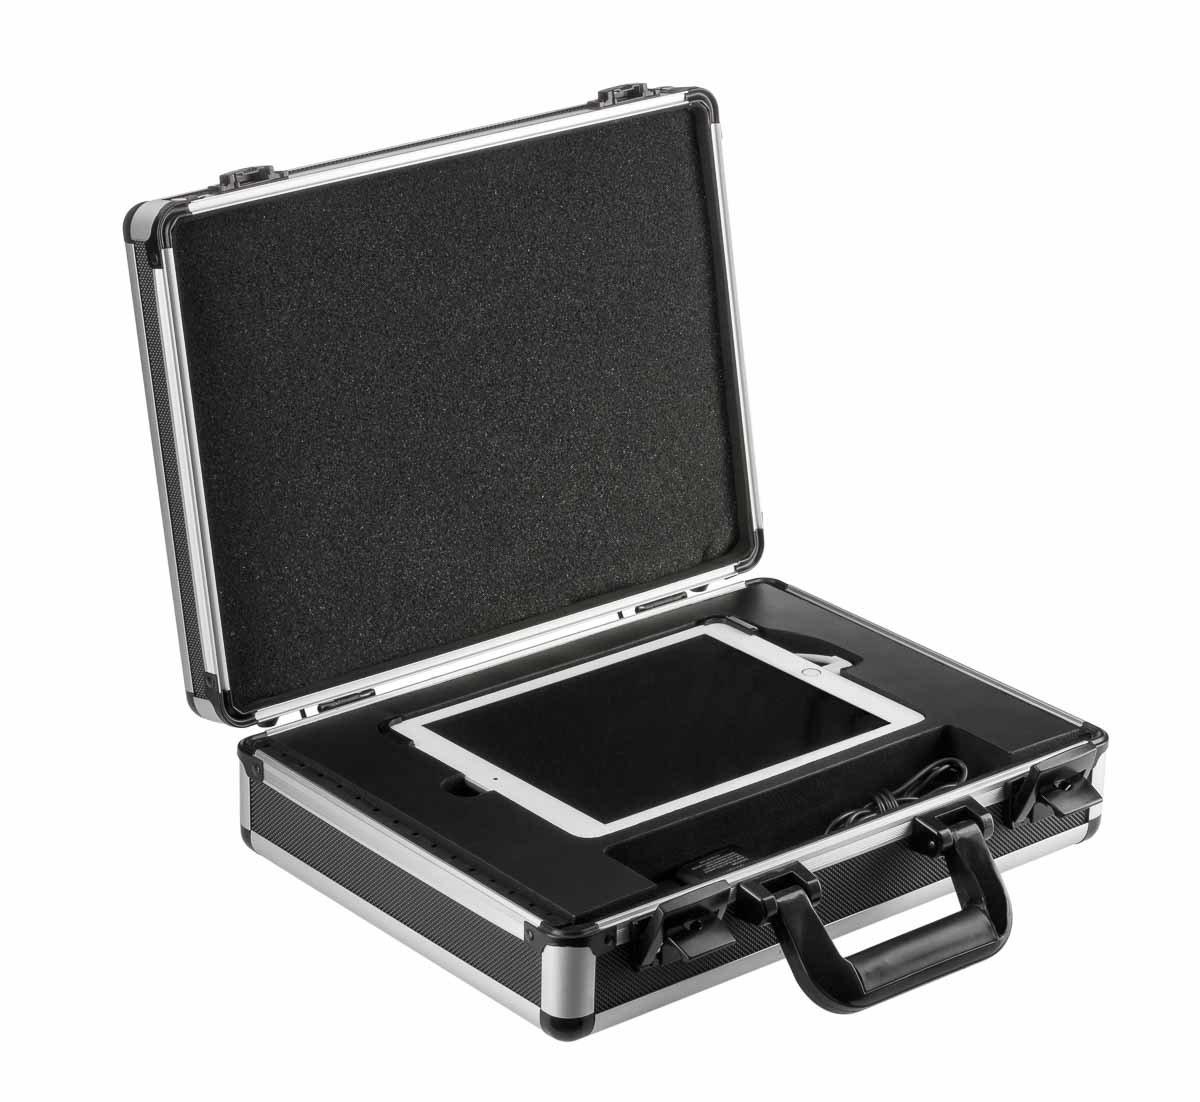 iPad and case_Box opened with ipad inside